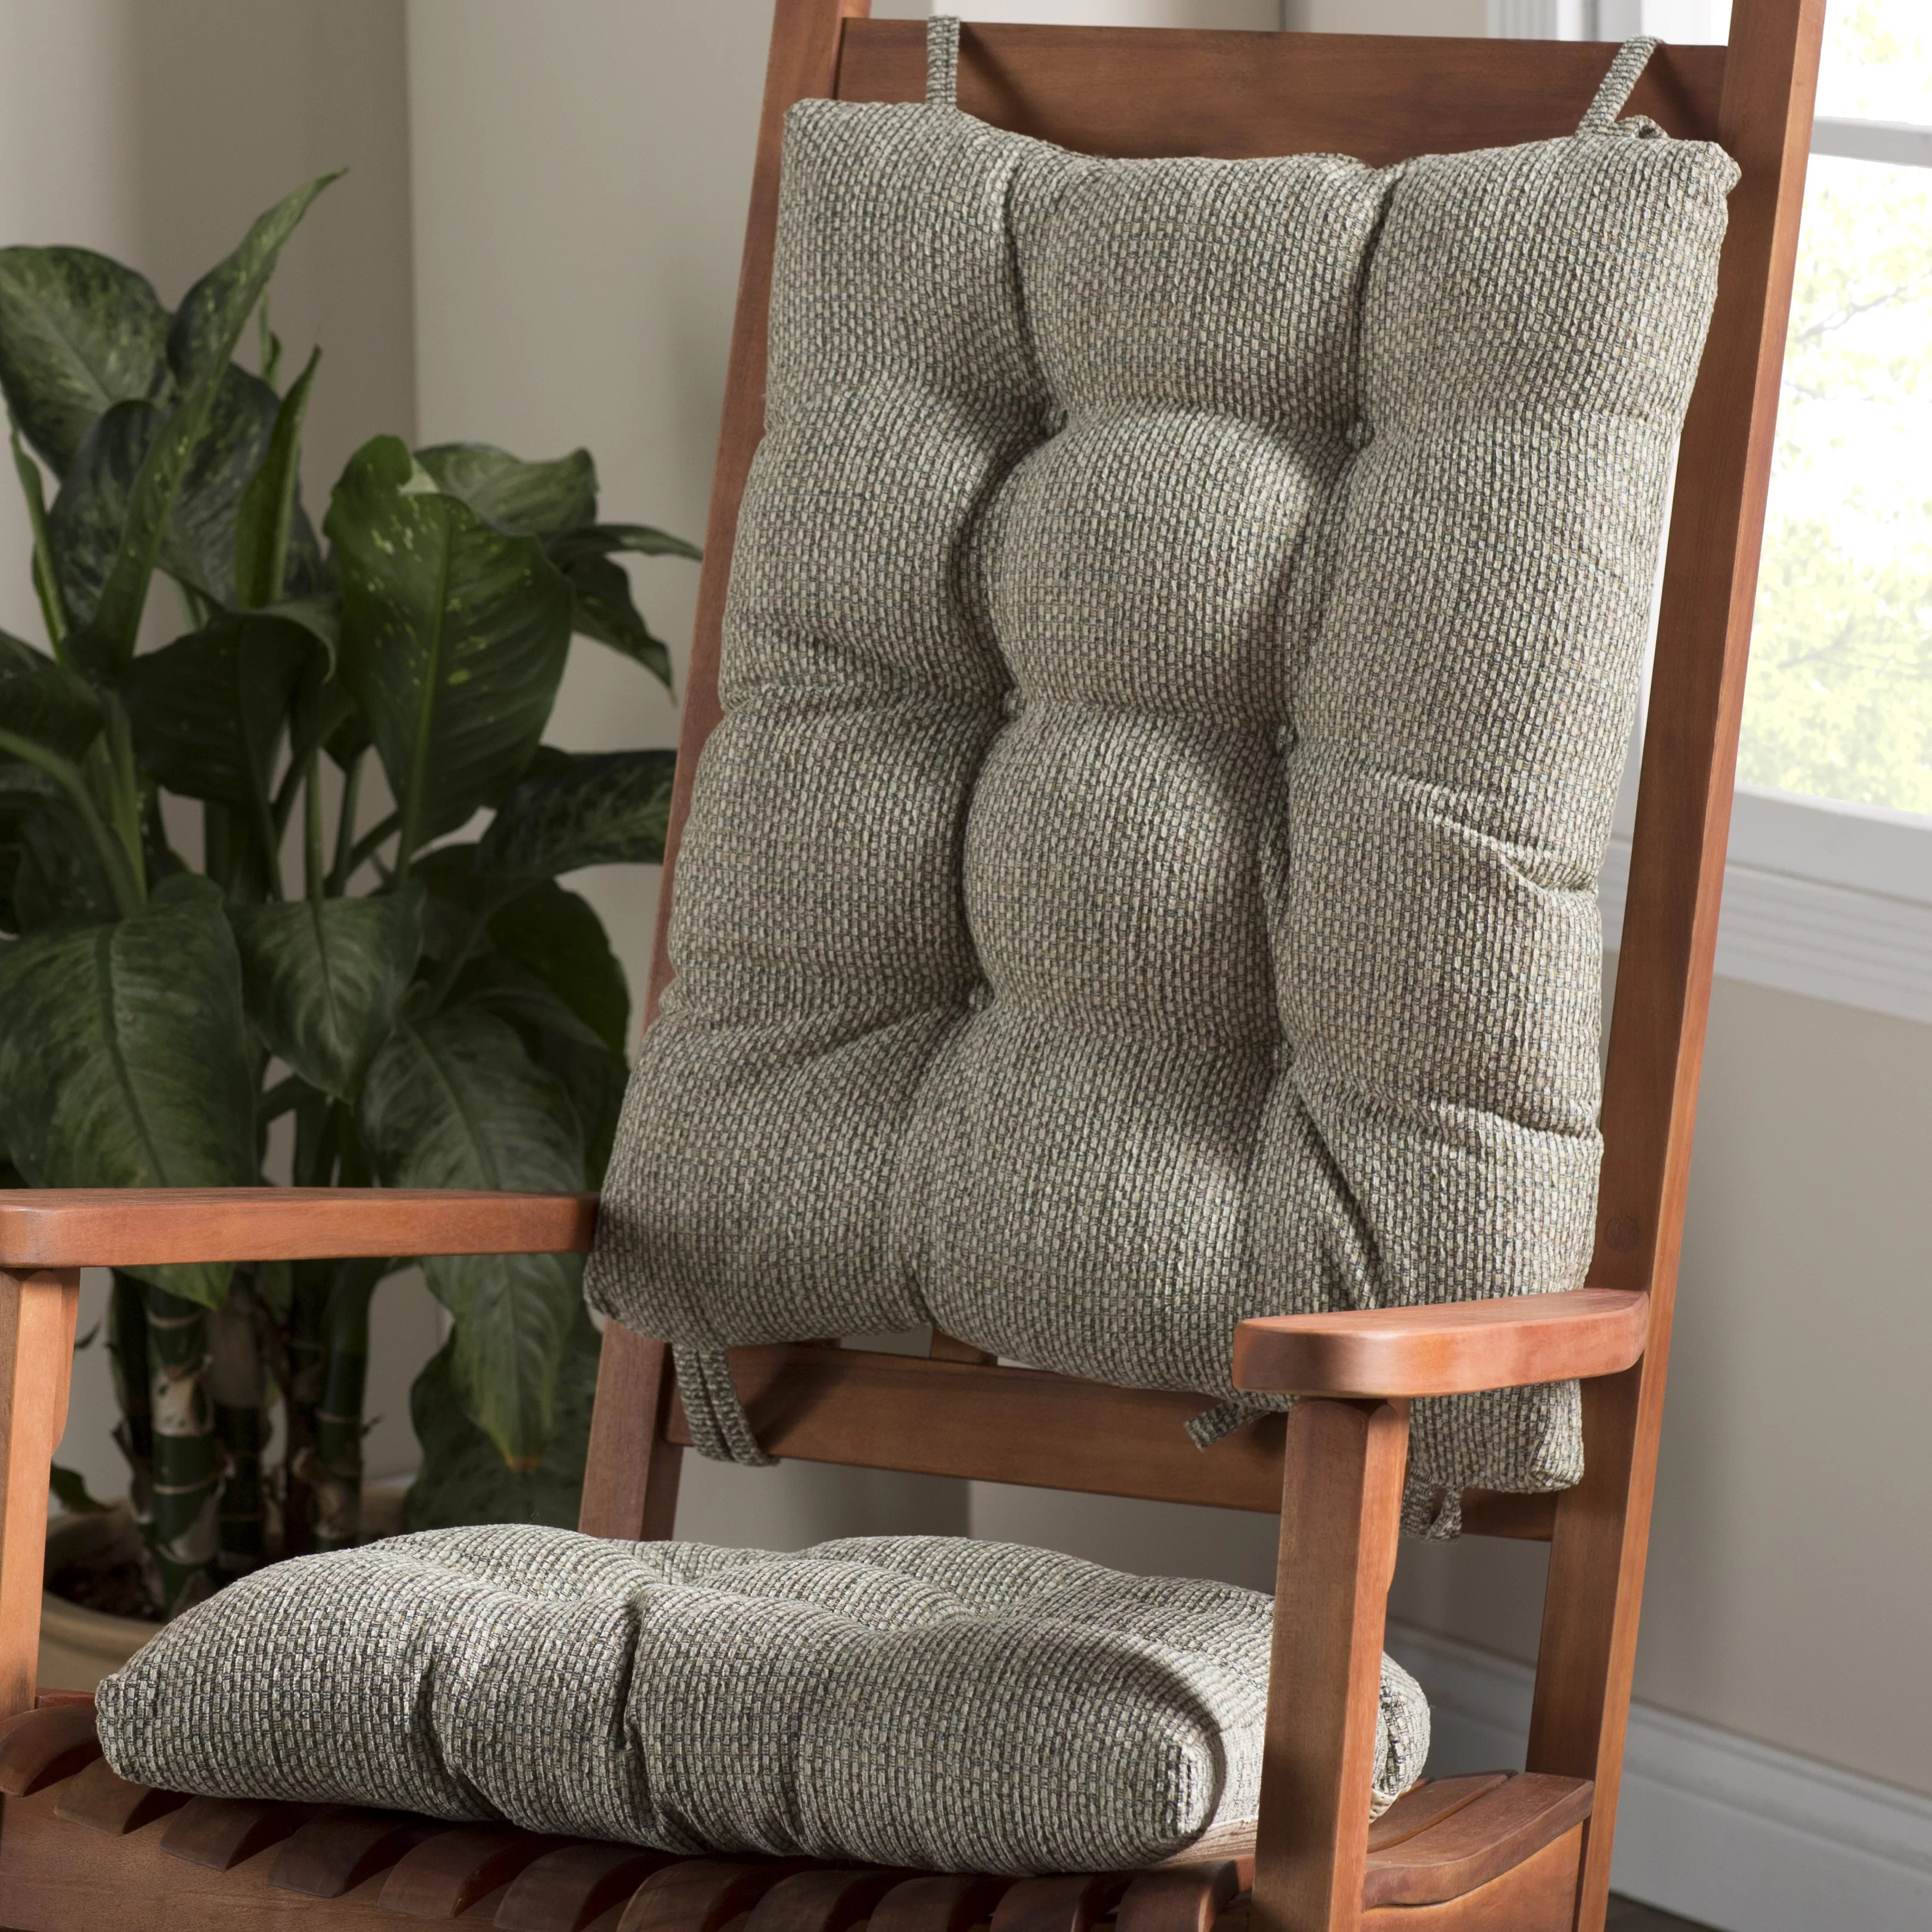 windsor rocking chair cushions kreg jig adirondack plans wayfair ca save